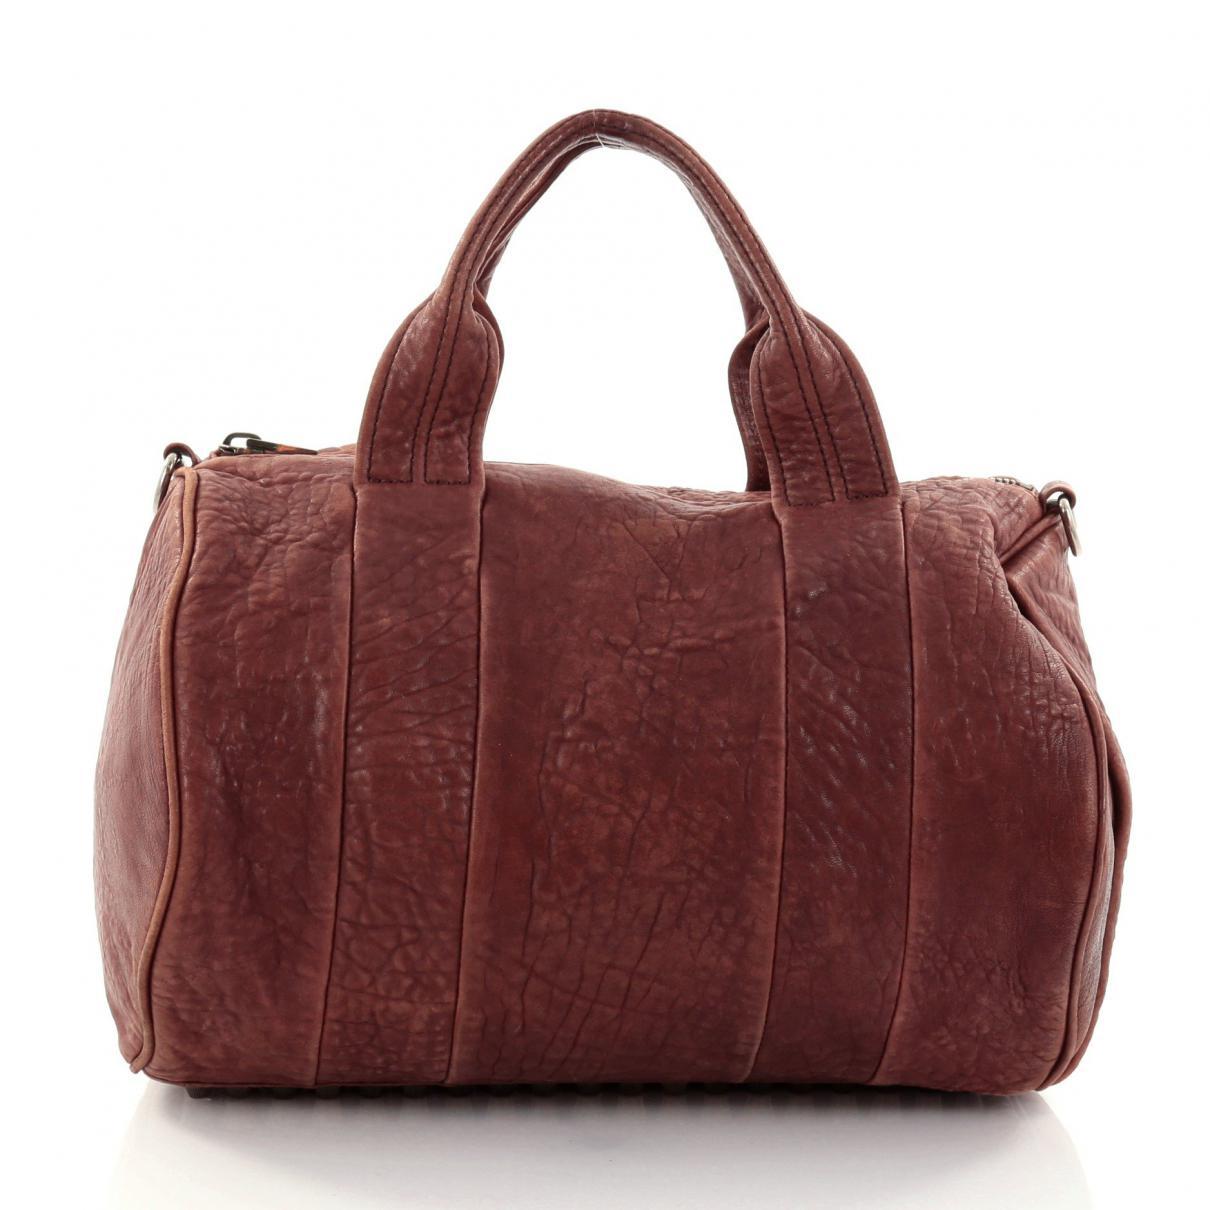 Alexander Wang Pre-owned - Leather handbag NR2PvZ